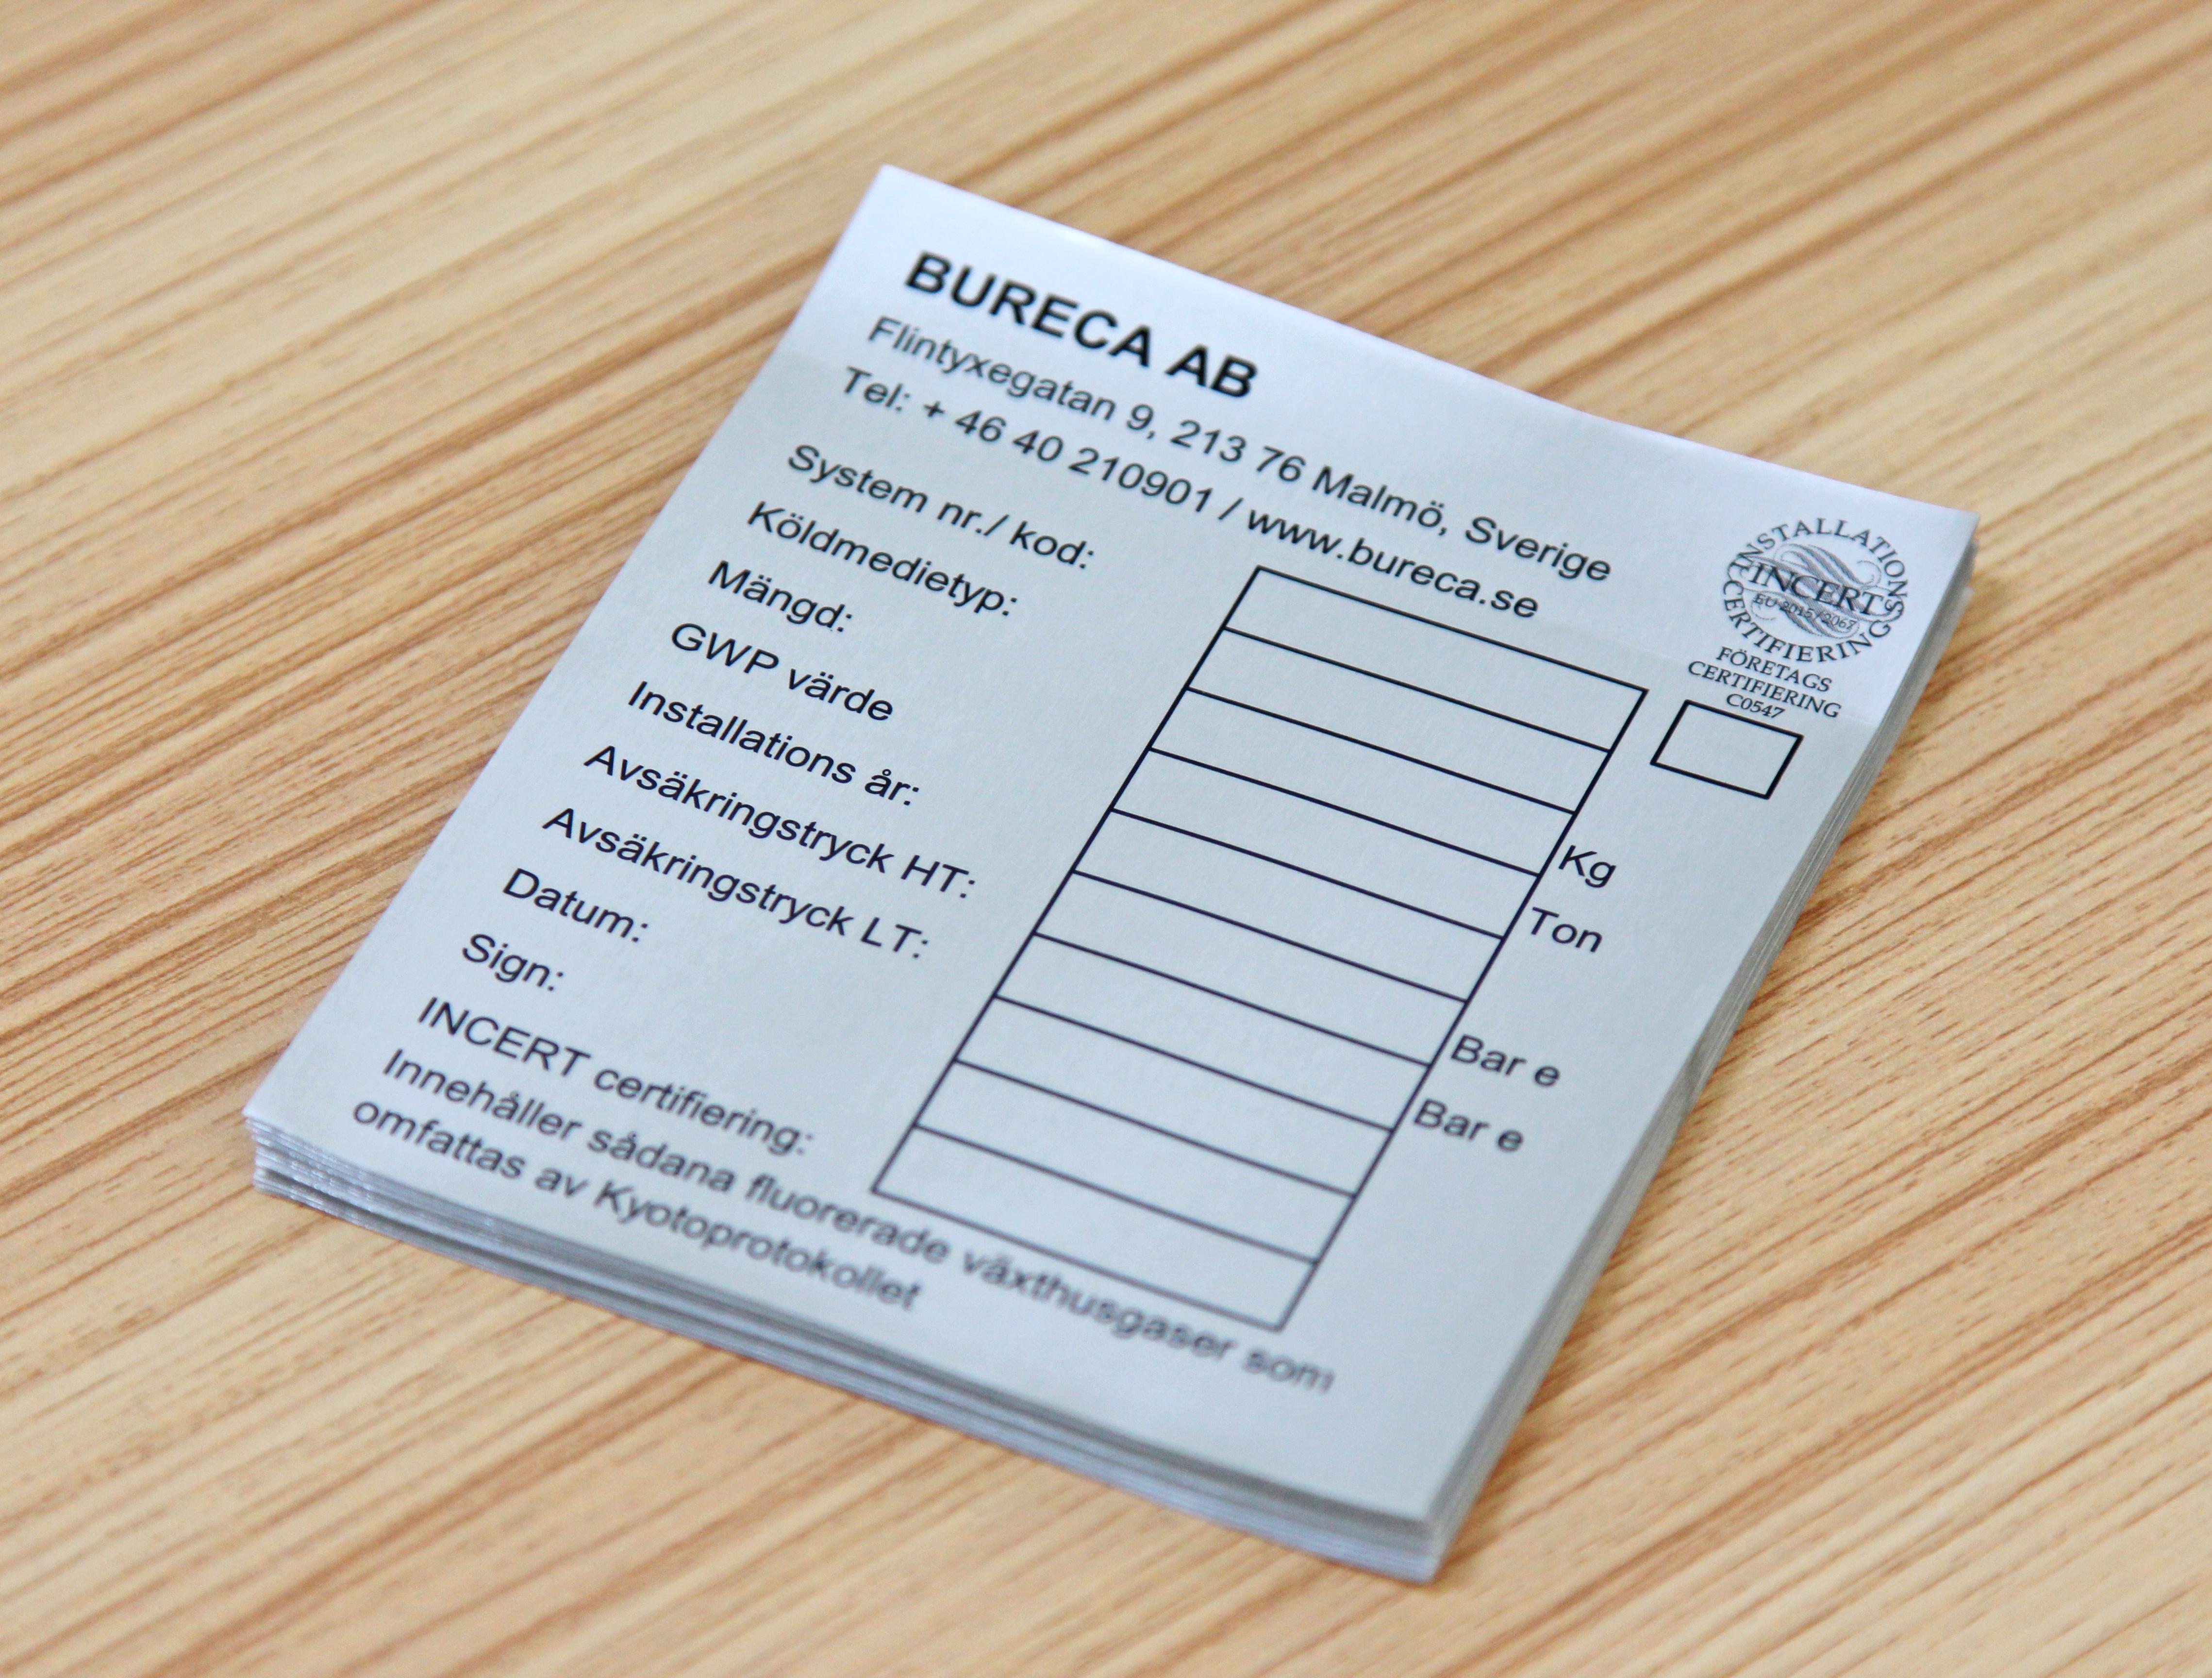 Aluminum stickers sticker printing fast sticker printing how to print stickers